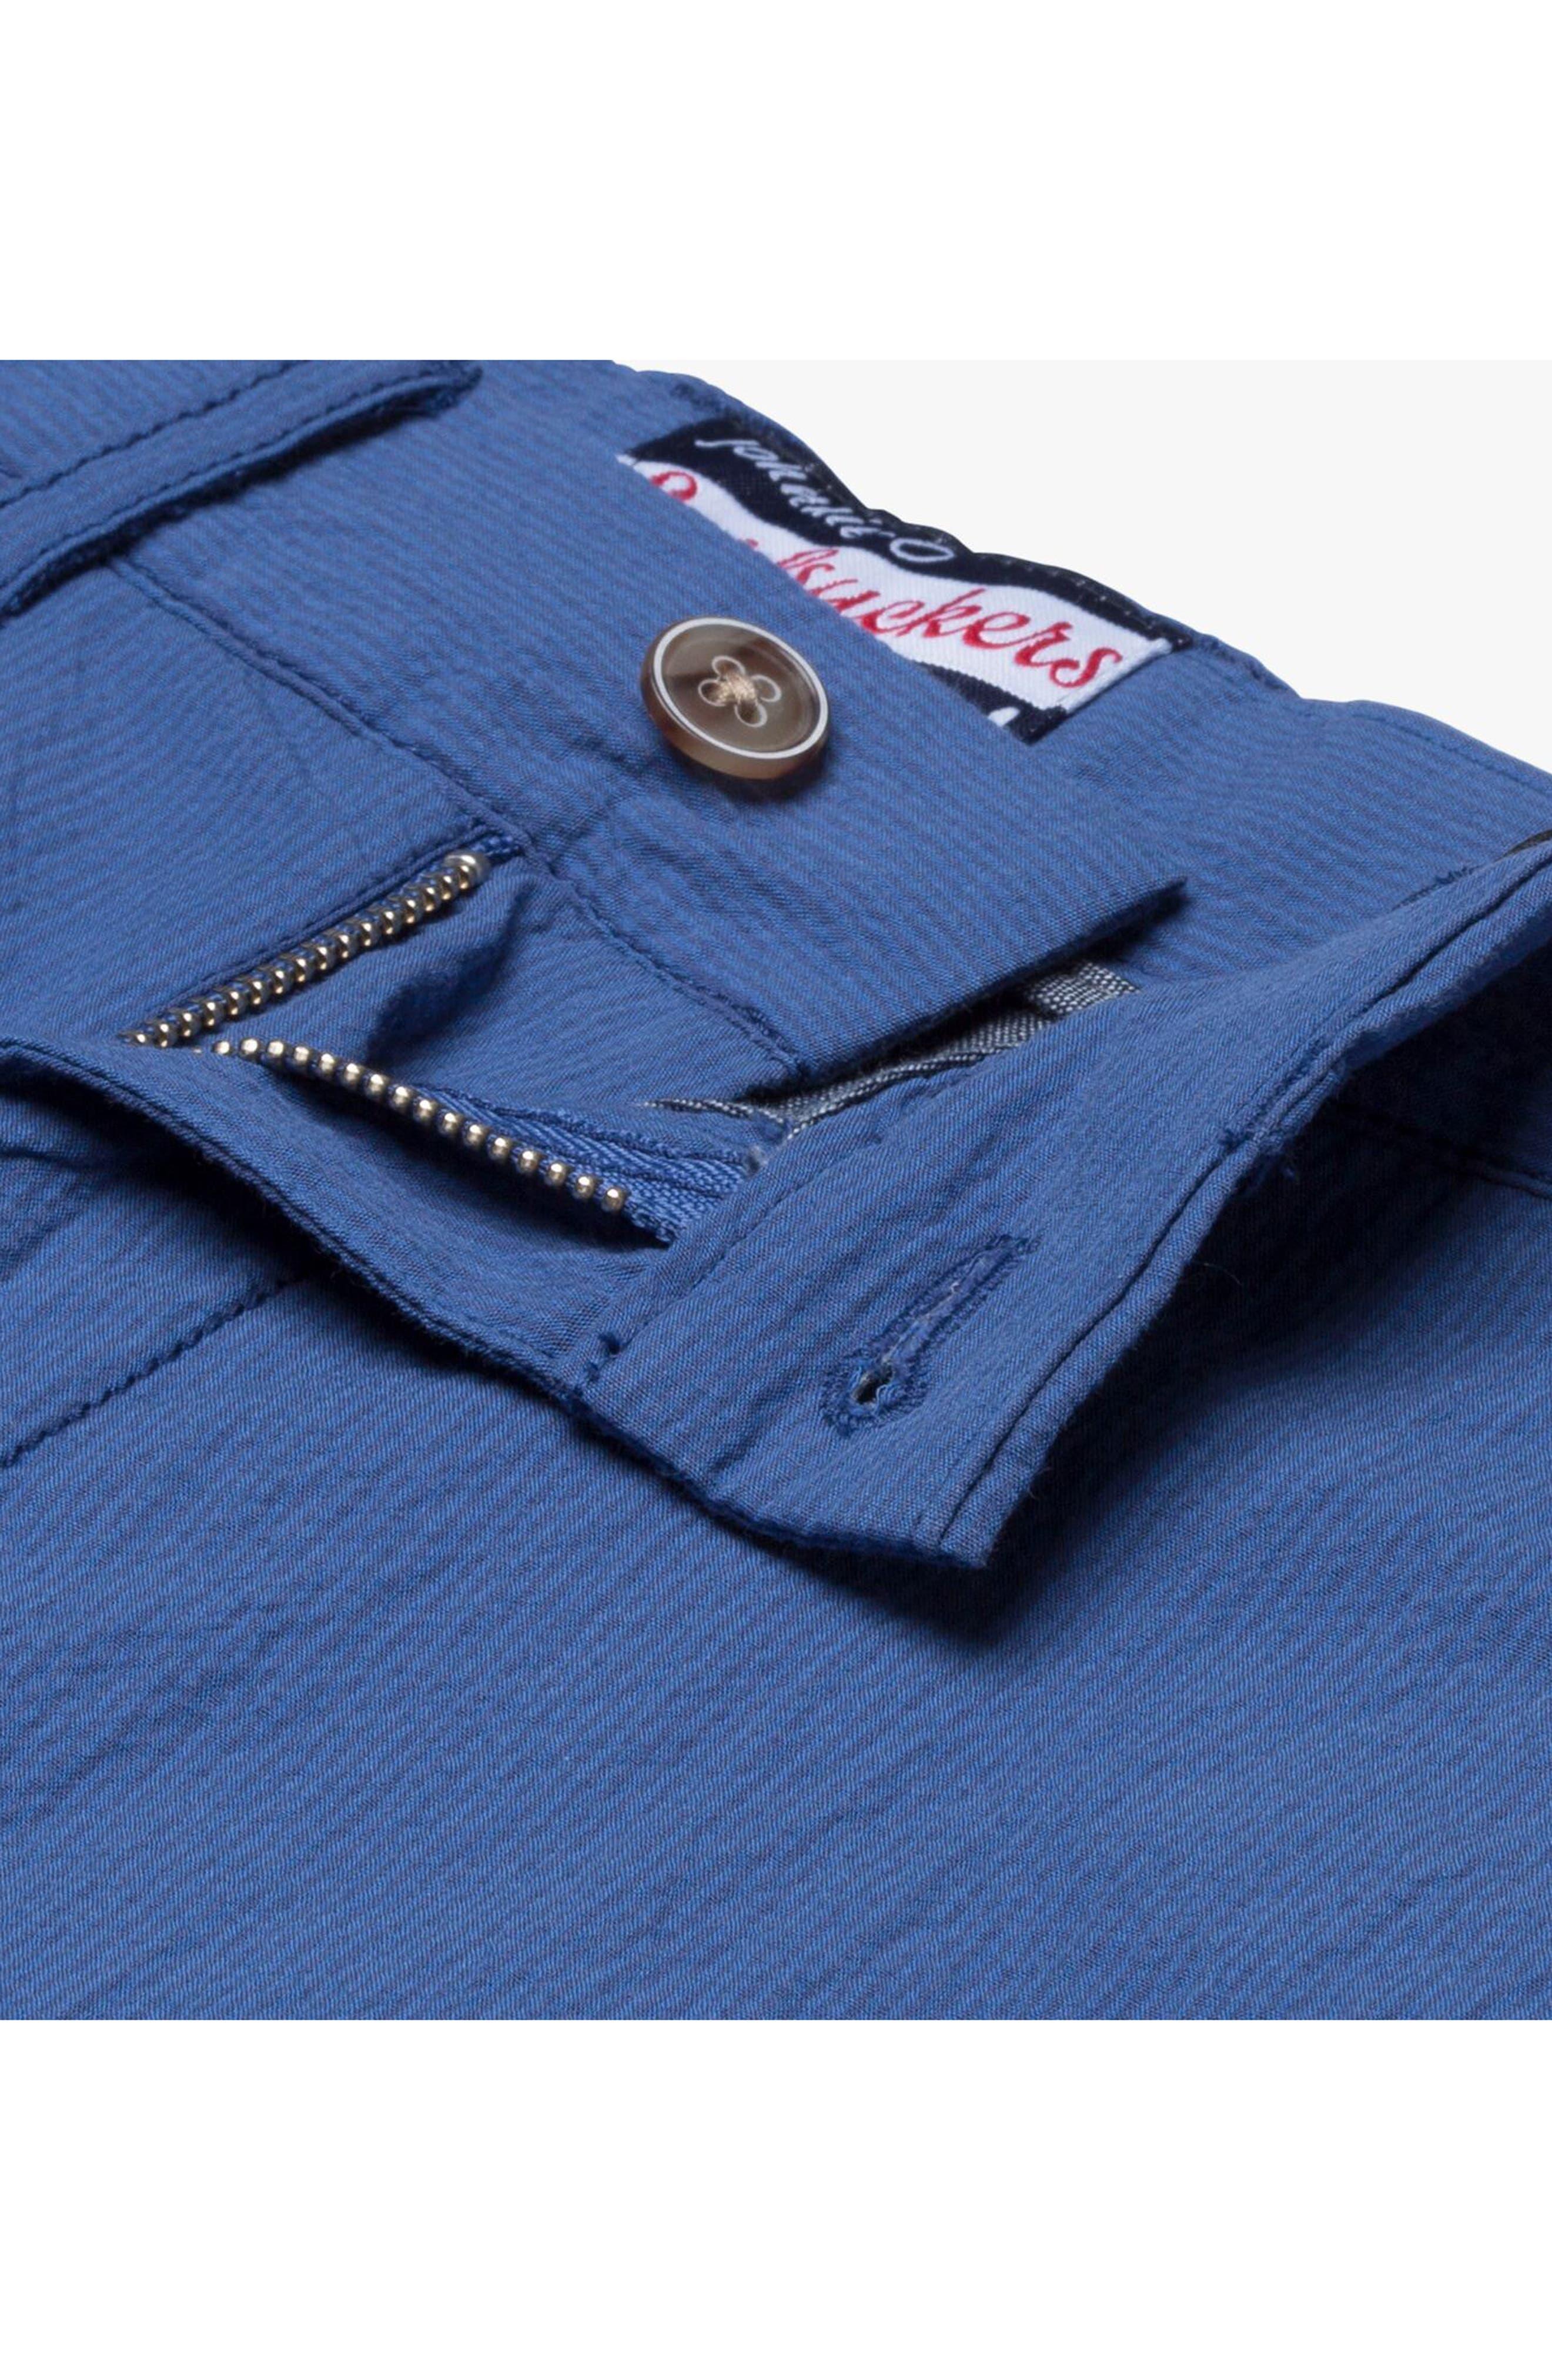 Bryson Seersucker Shorts,                             Alternate thumbnail 3, color,                             Ripple